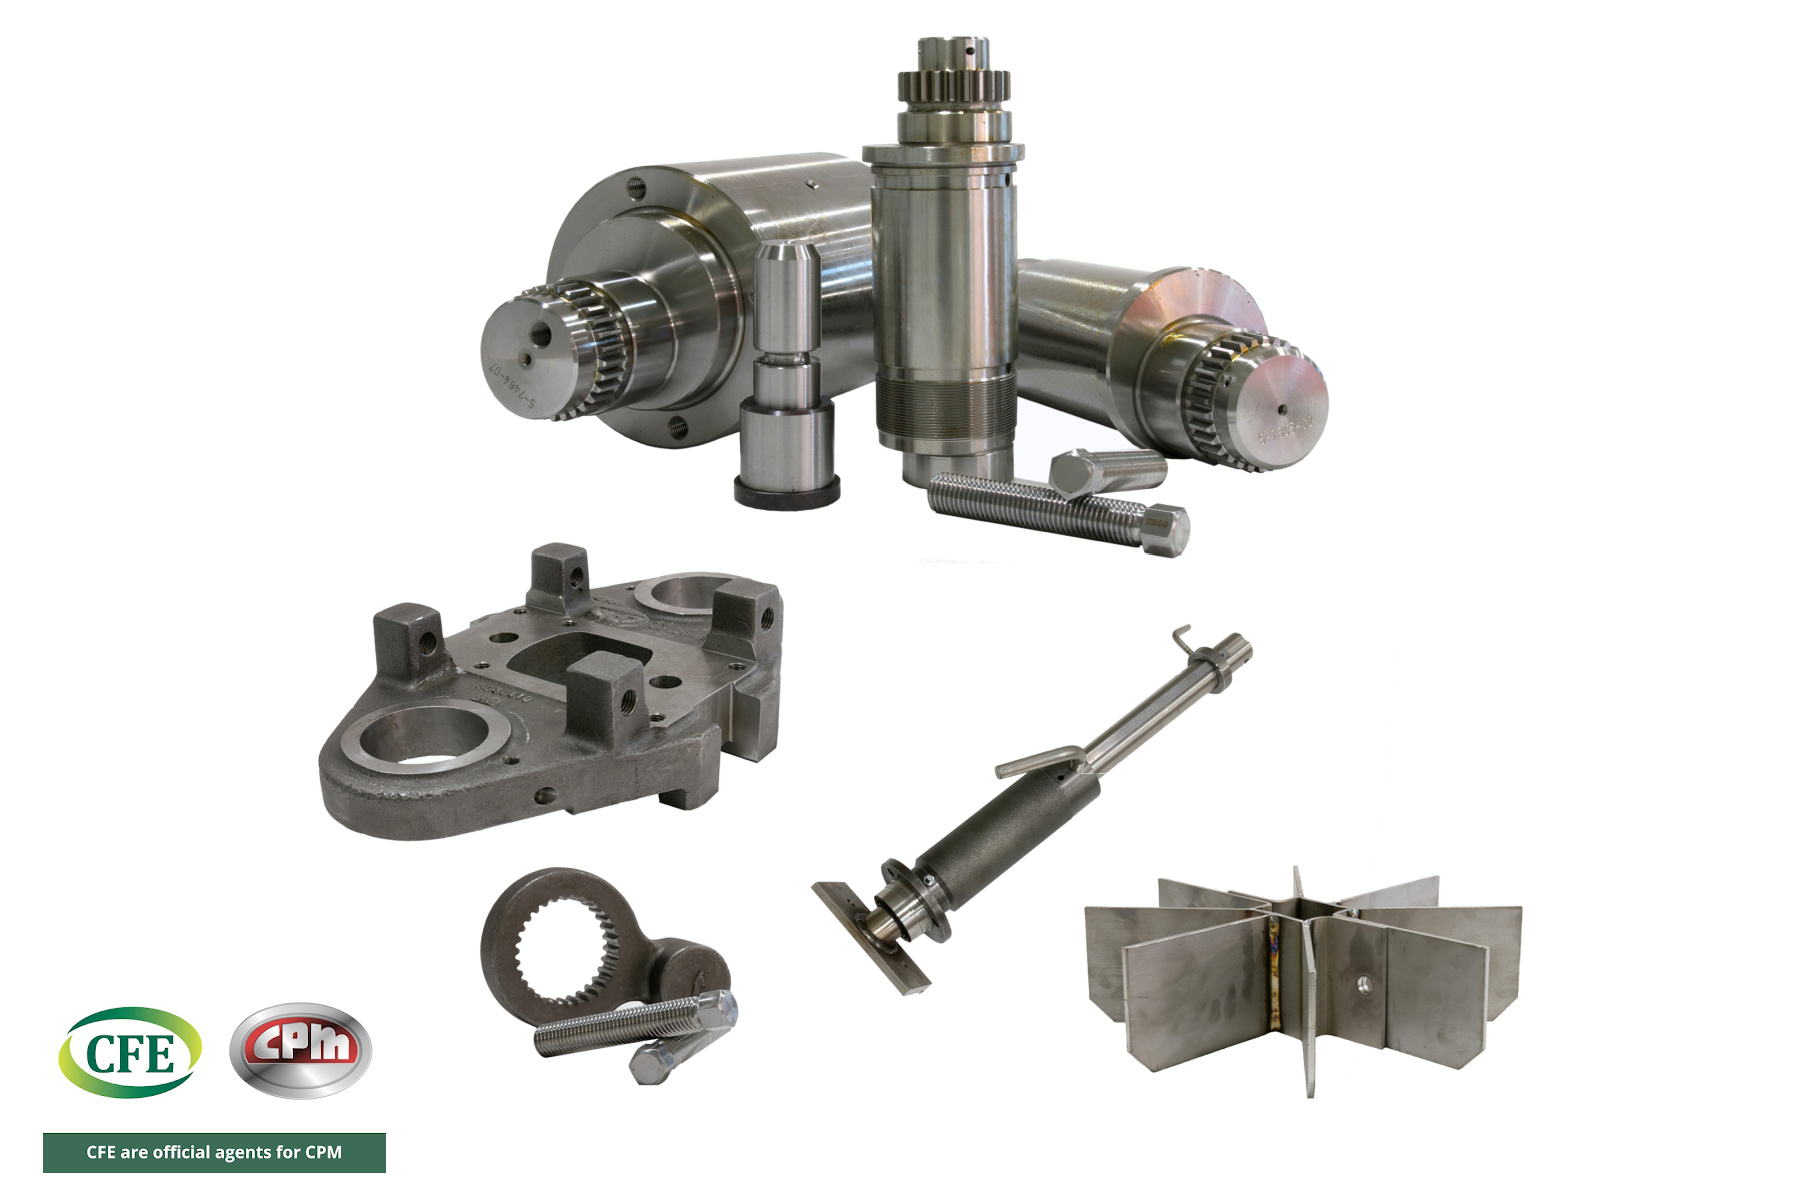 CFE Spare Parts